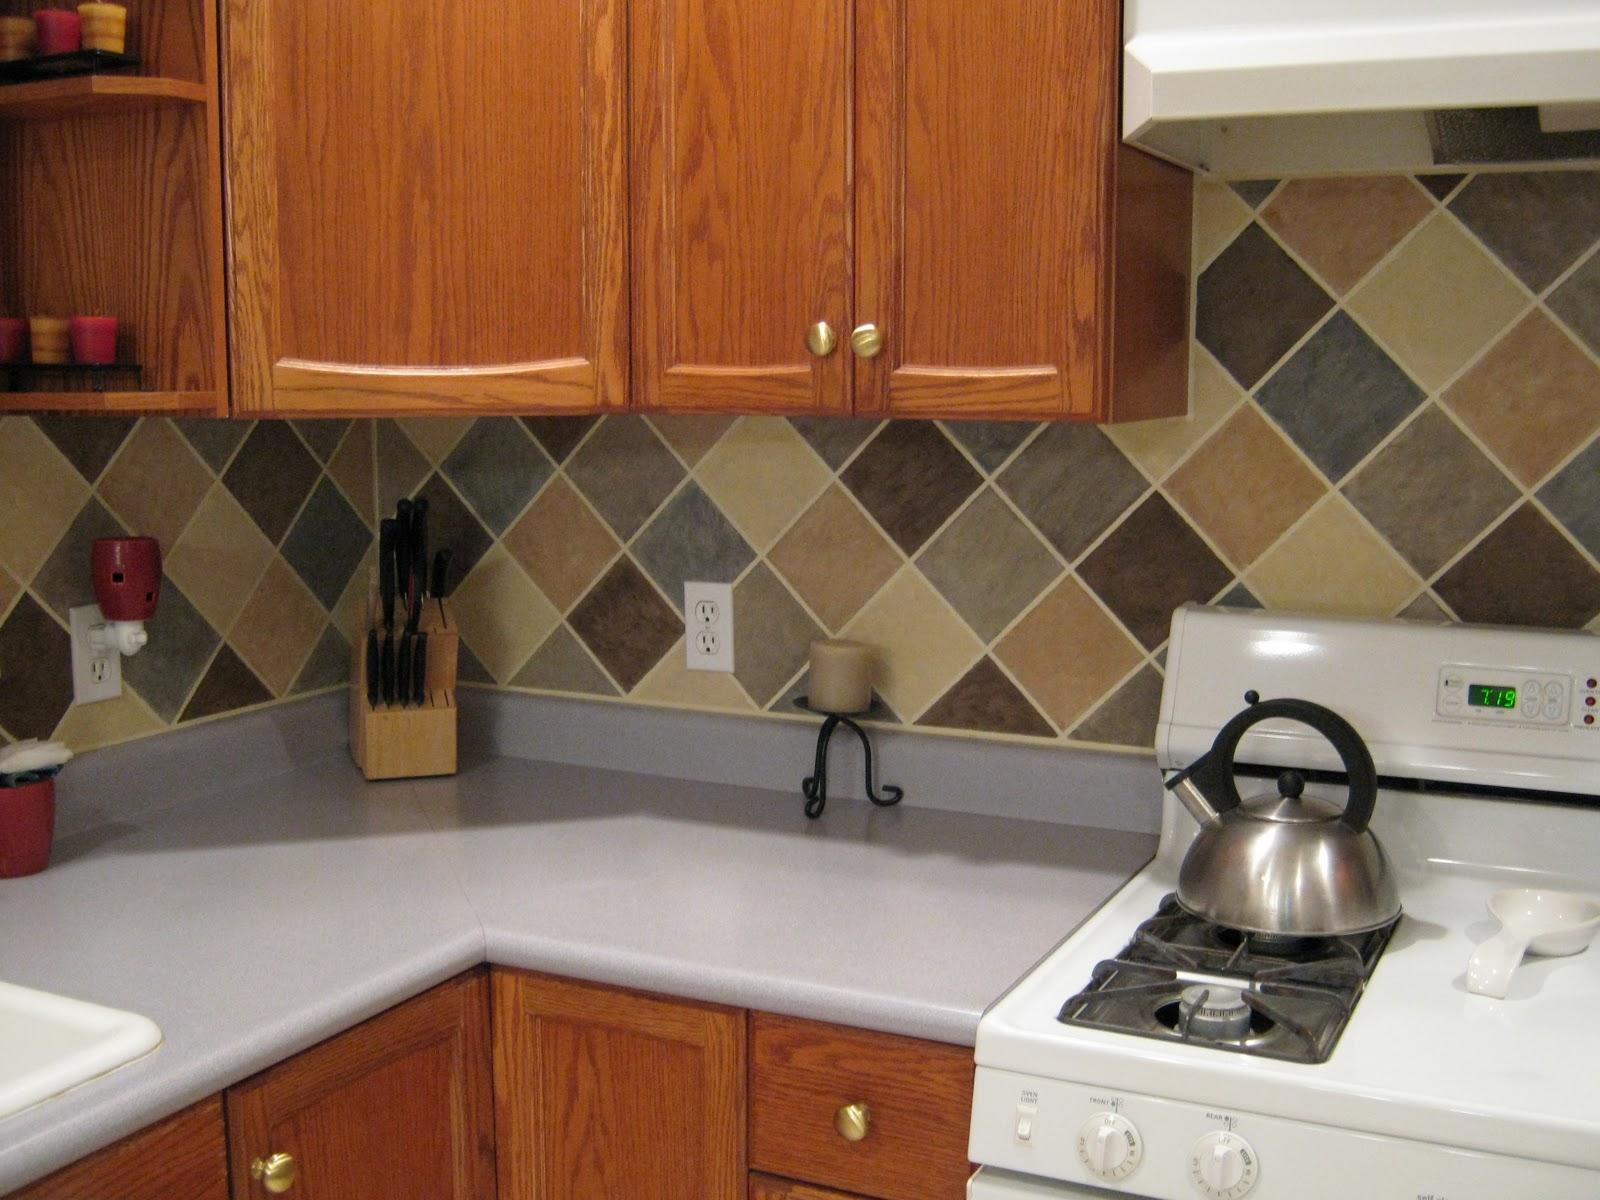 my kitchen backsplash looks like tile 979